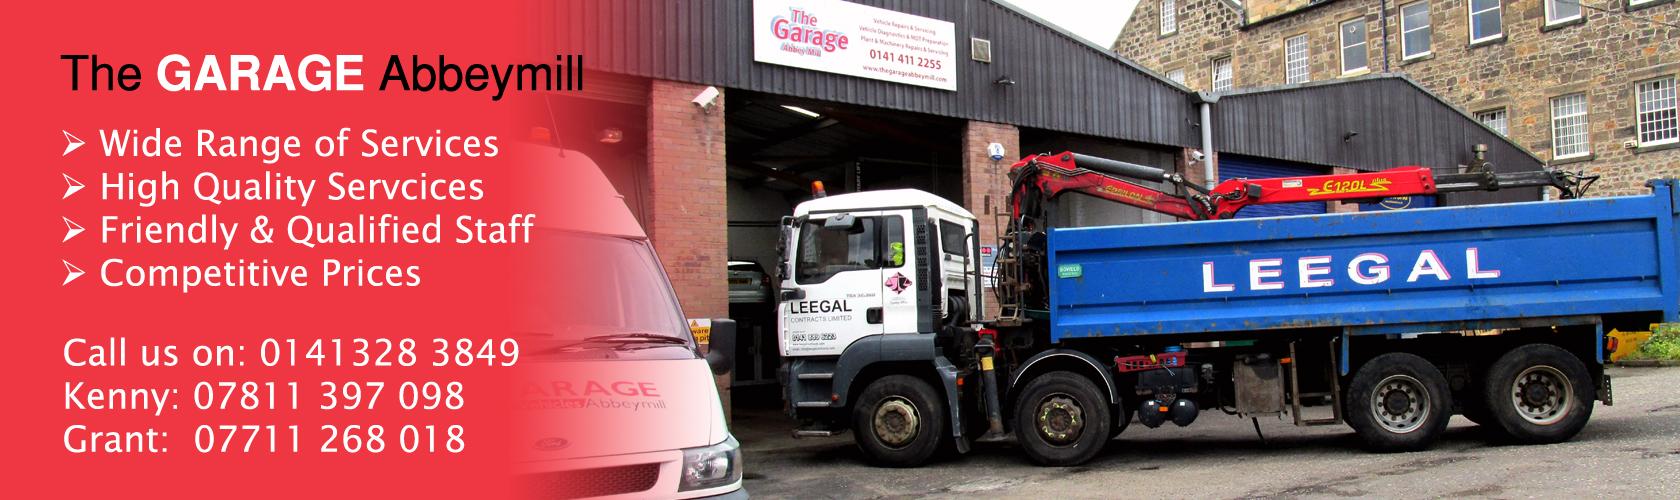 The GARAGE Abbeymill Paisley Renfrewshire Vehicles Services